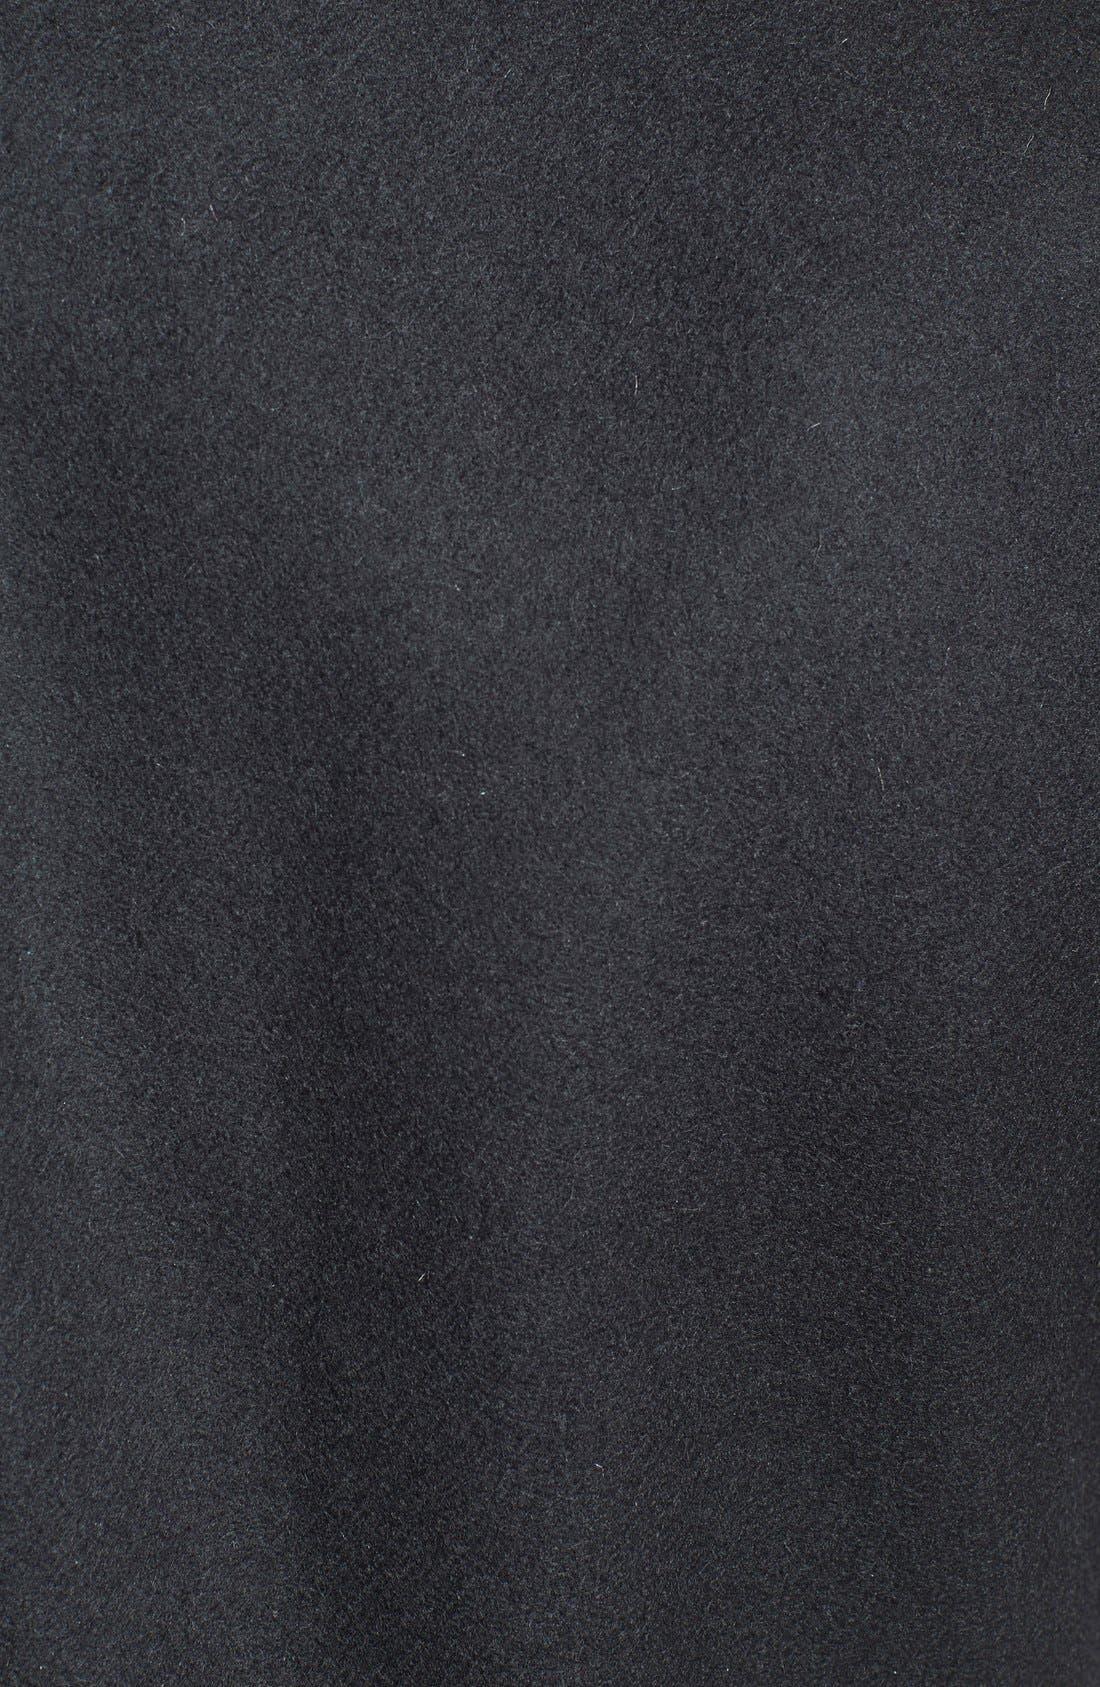 FILSON,                             'Mackinaw' Wool Vest,                             Alternate thumbnail 2, color,                             001